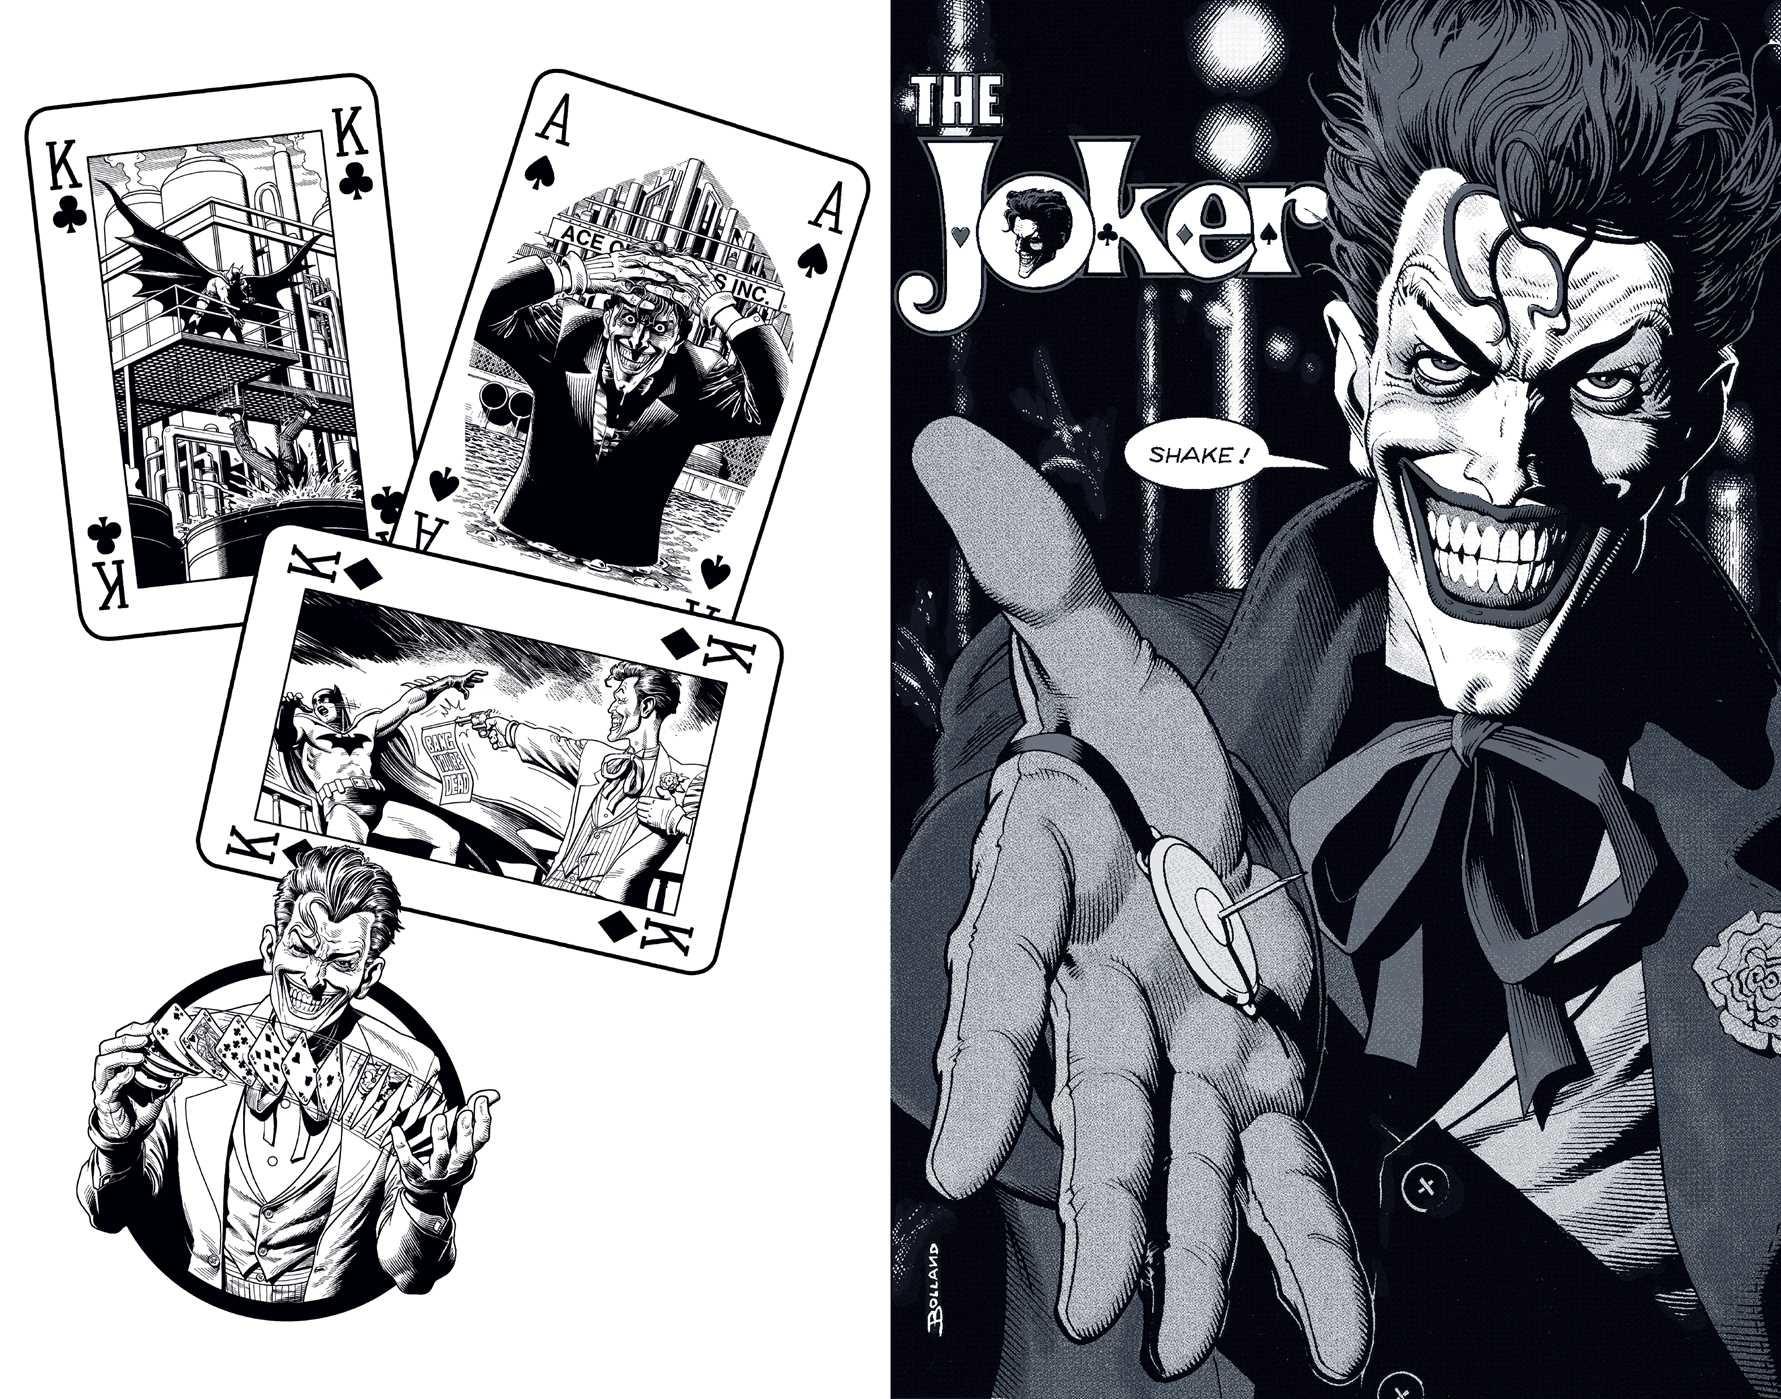 Dc comics the joker hardcover ruled journal artist edition 9781683833307.in04